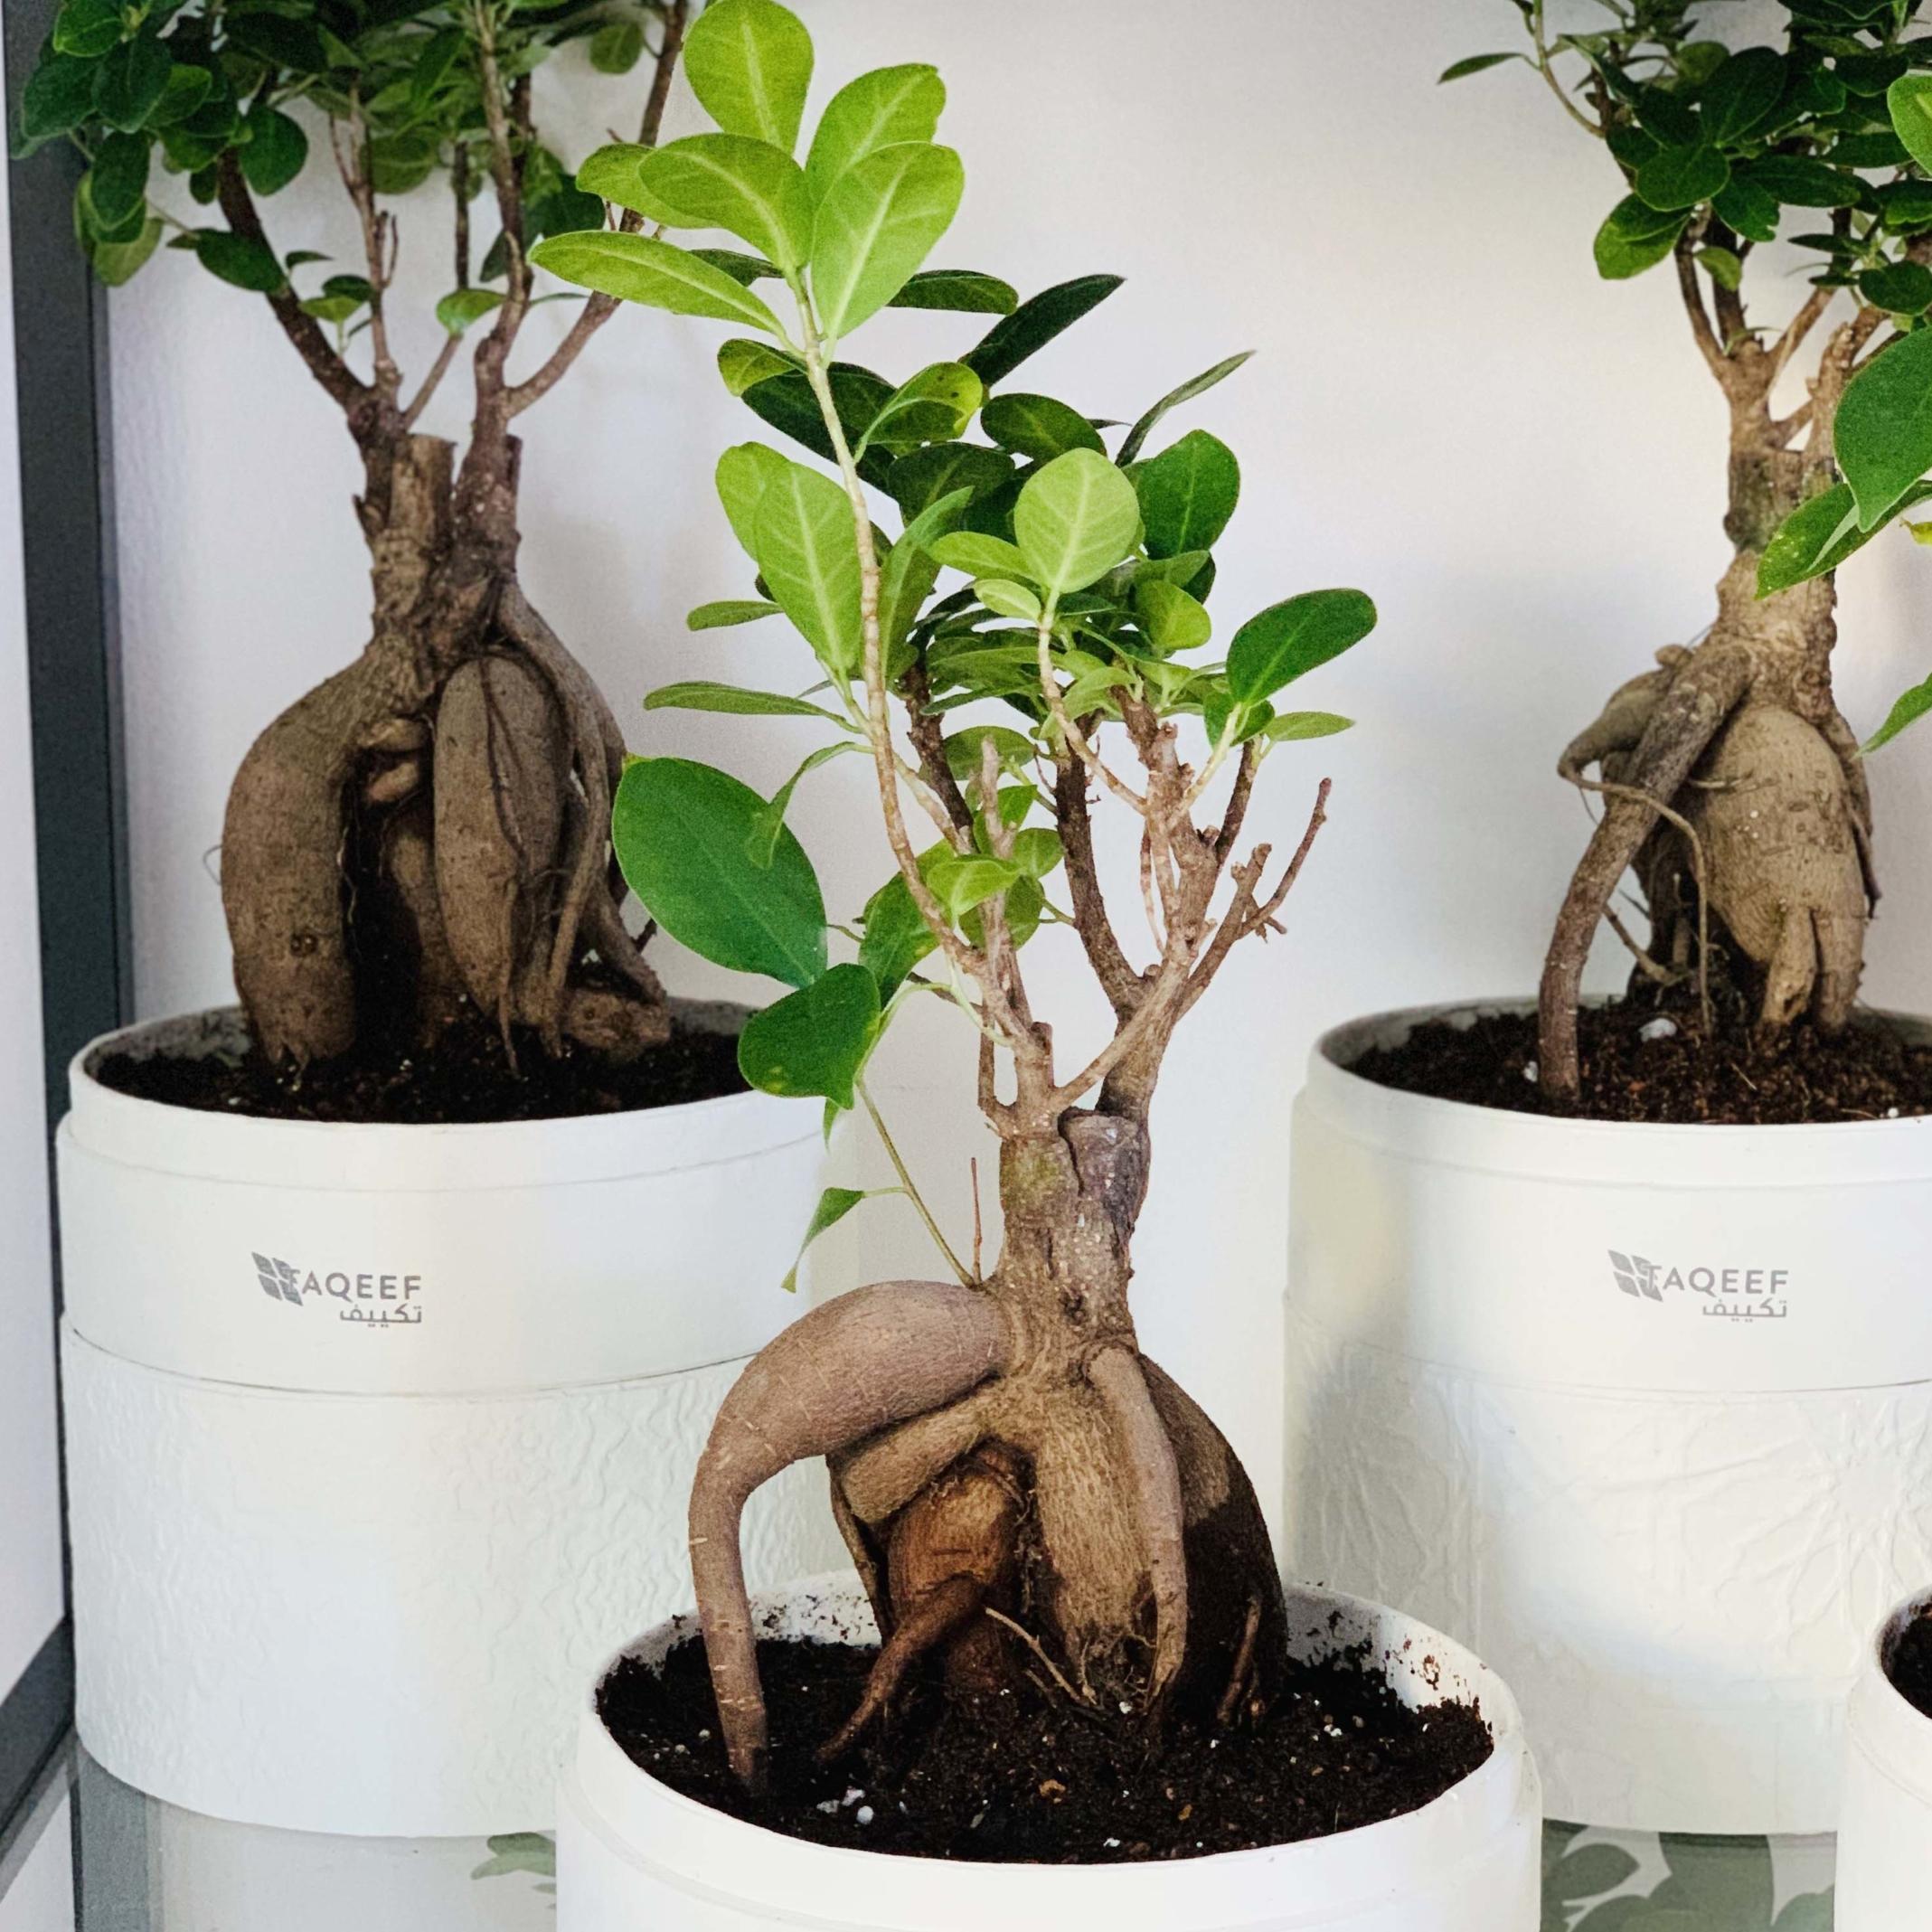 bonsai in a white box